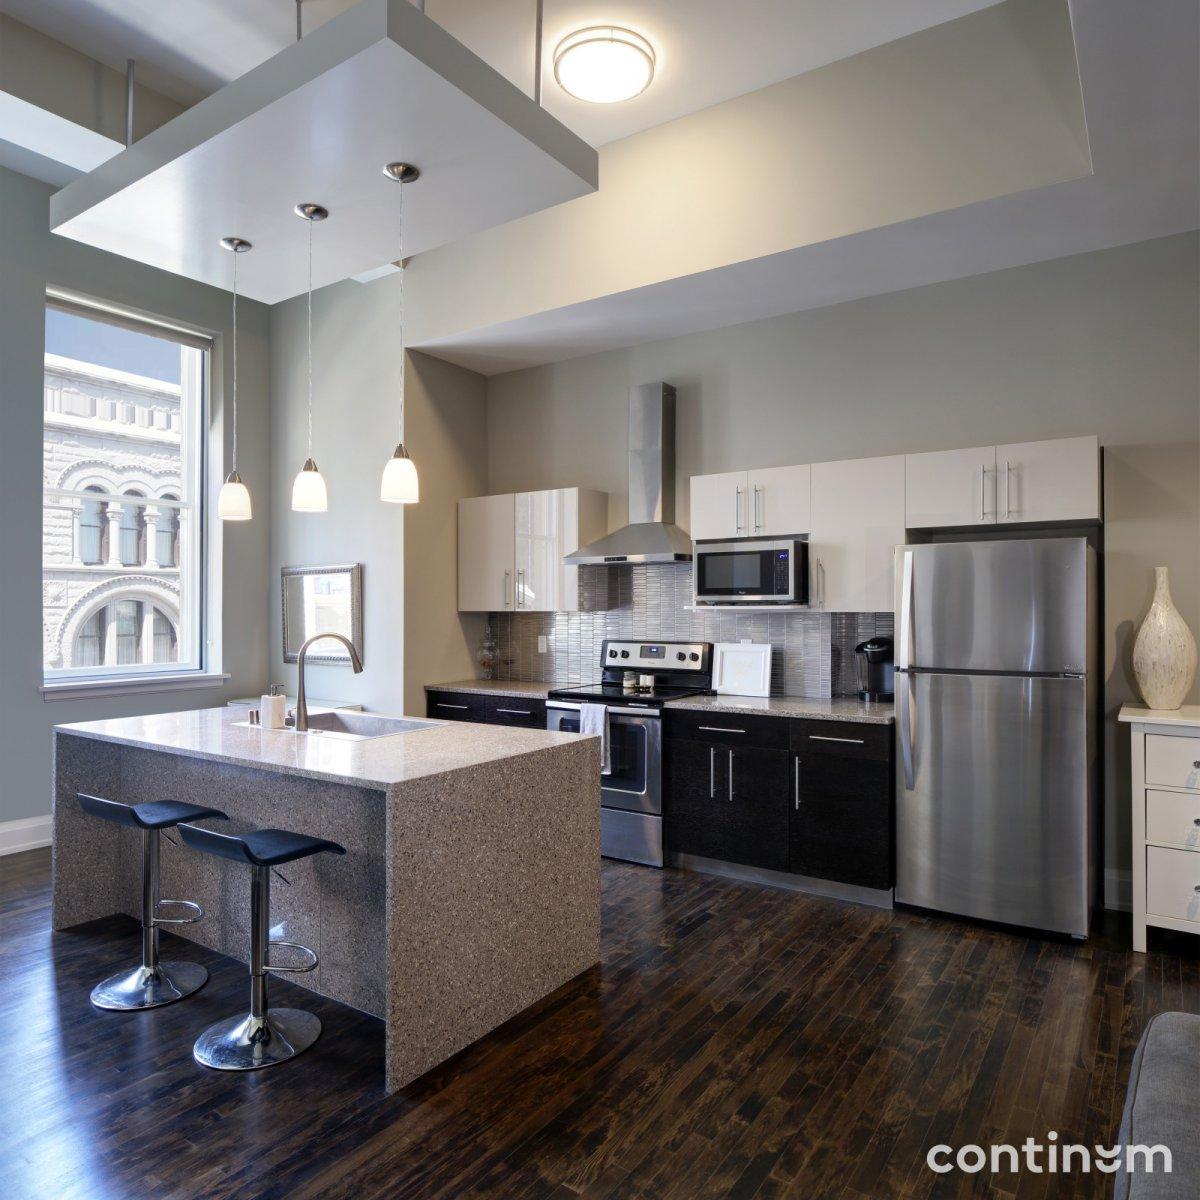 Cheep Apartments Flats Inside: Eyes On Milwaukee: Inside The Mackie Flats » Urban Milwaukee